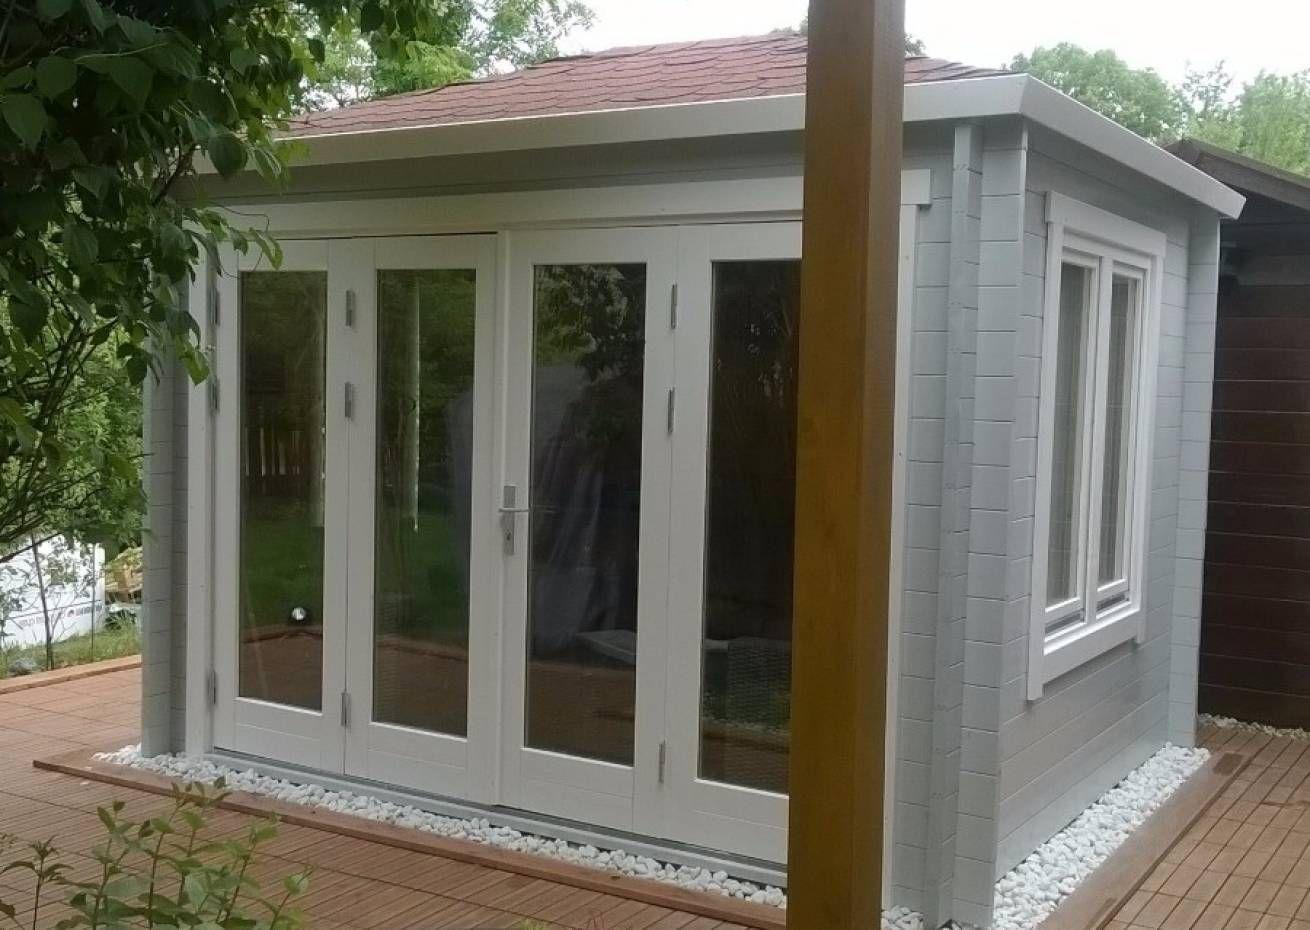 Gartenhaus Summertime40 mit großer Falttür